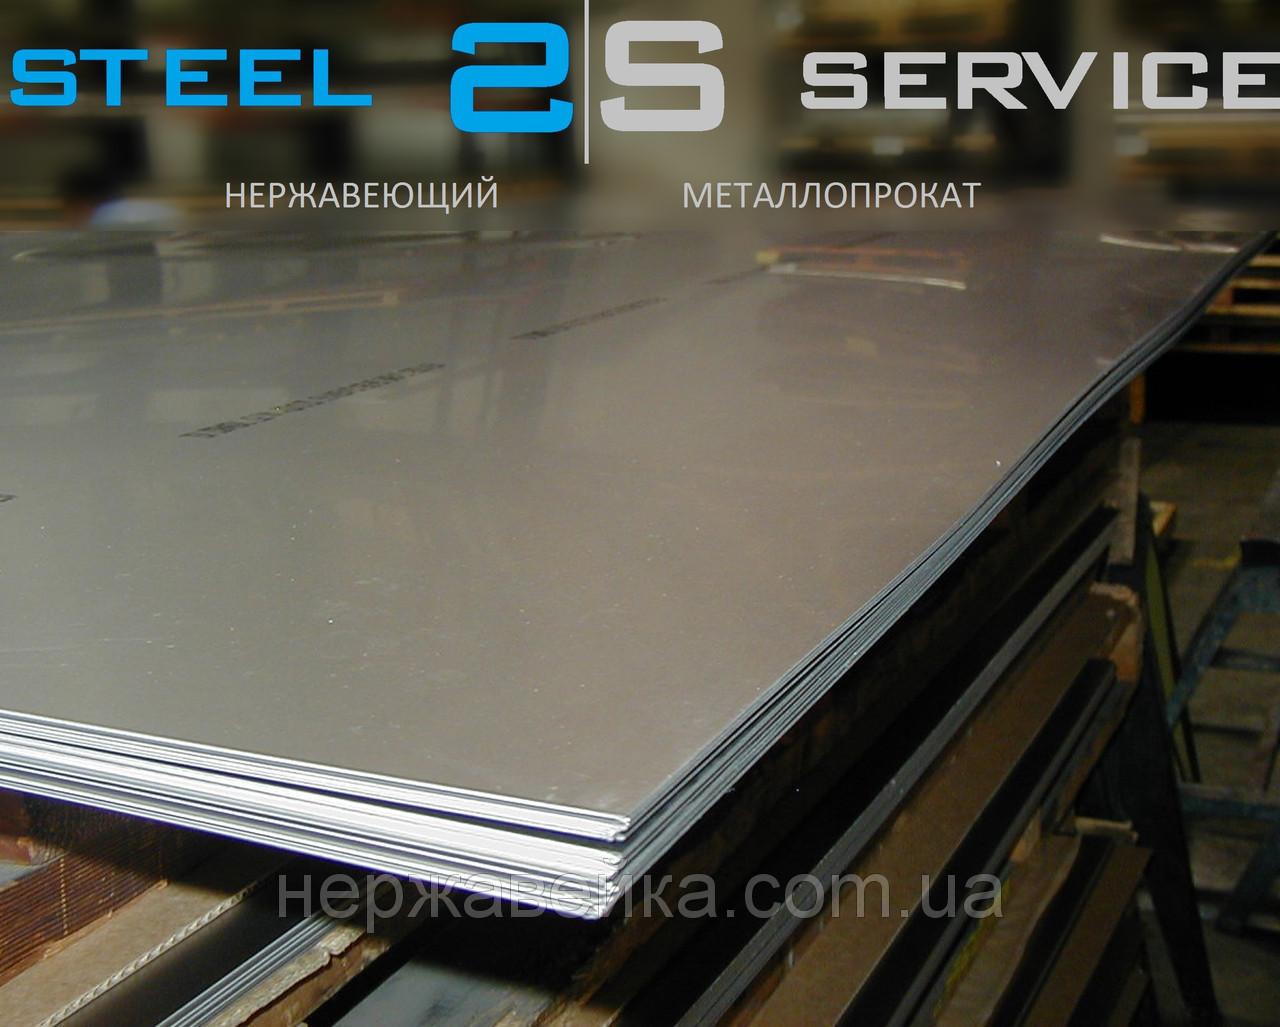 Нержавеющий лист 16х1000х2000мм  AISI 316L(03Х17Н14М3) F1 - горячекатанный,  кислотостойкий